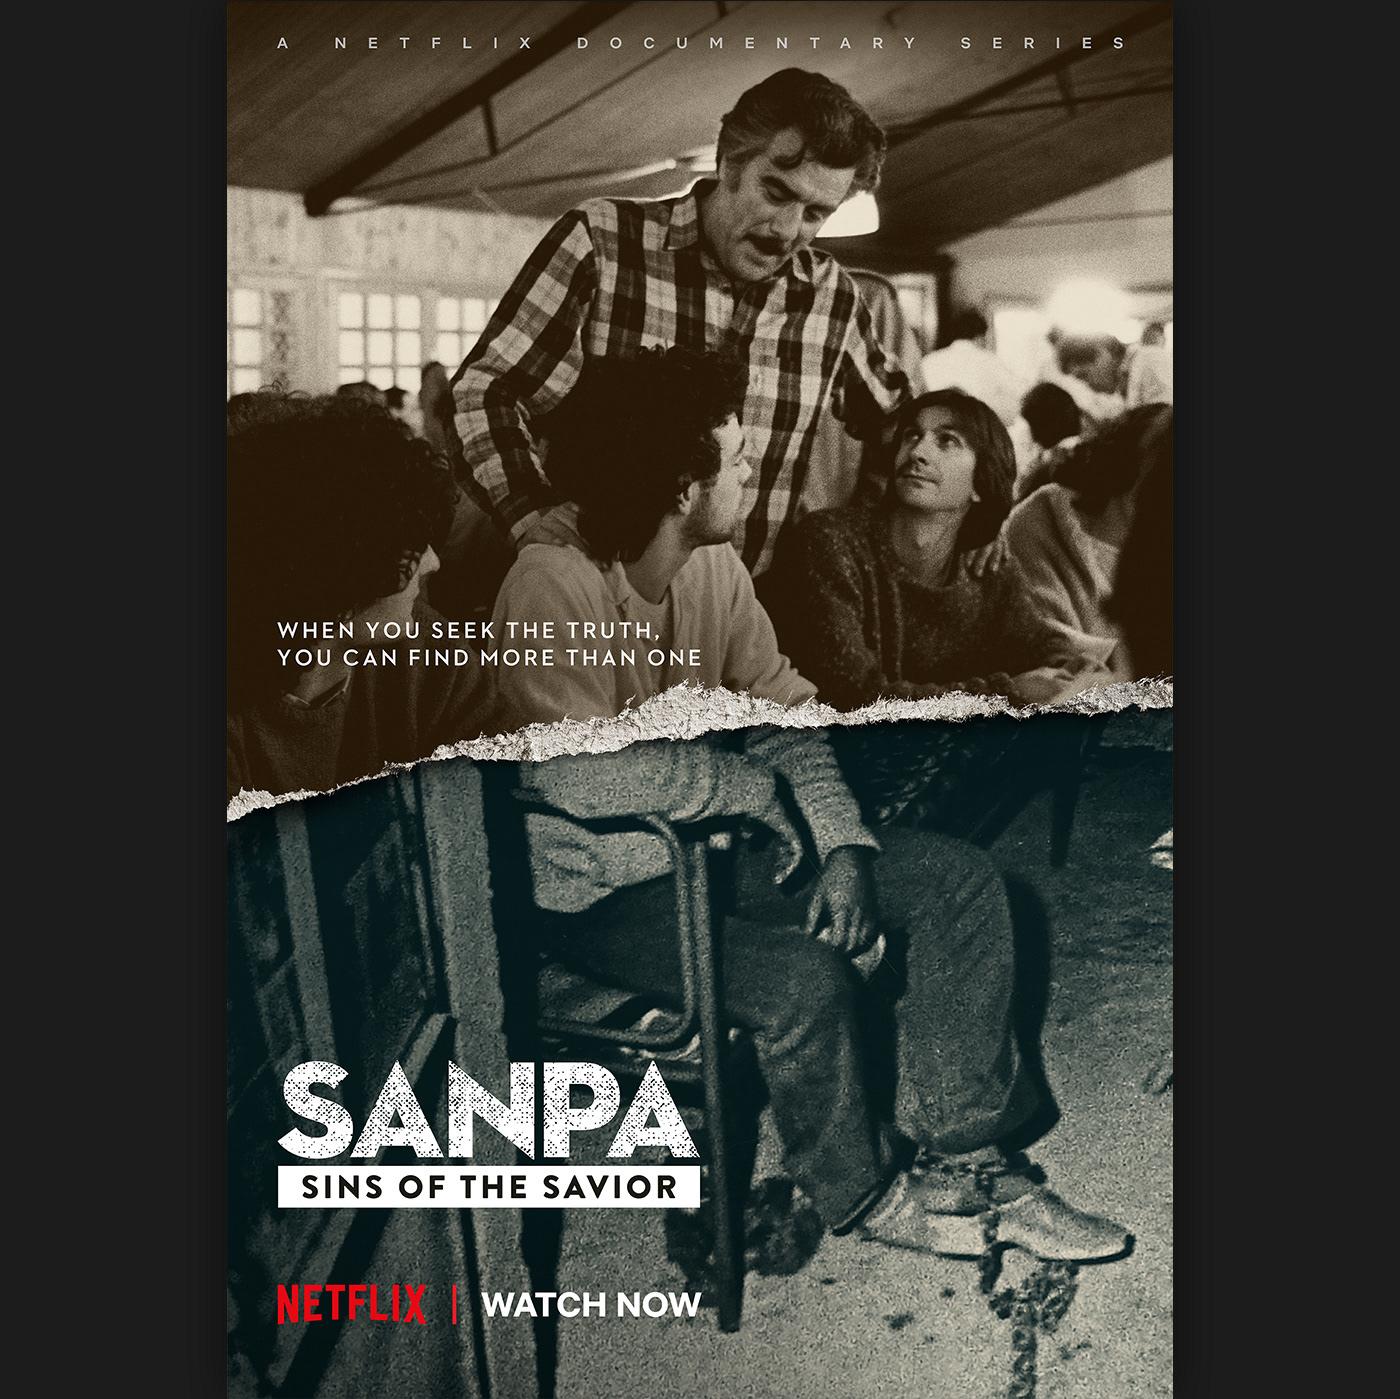 Documentary  heroine key art movie poster Muccioli   Netflix Original poster rehab series